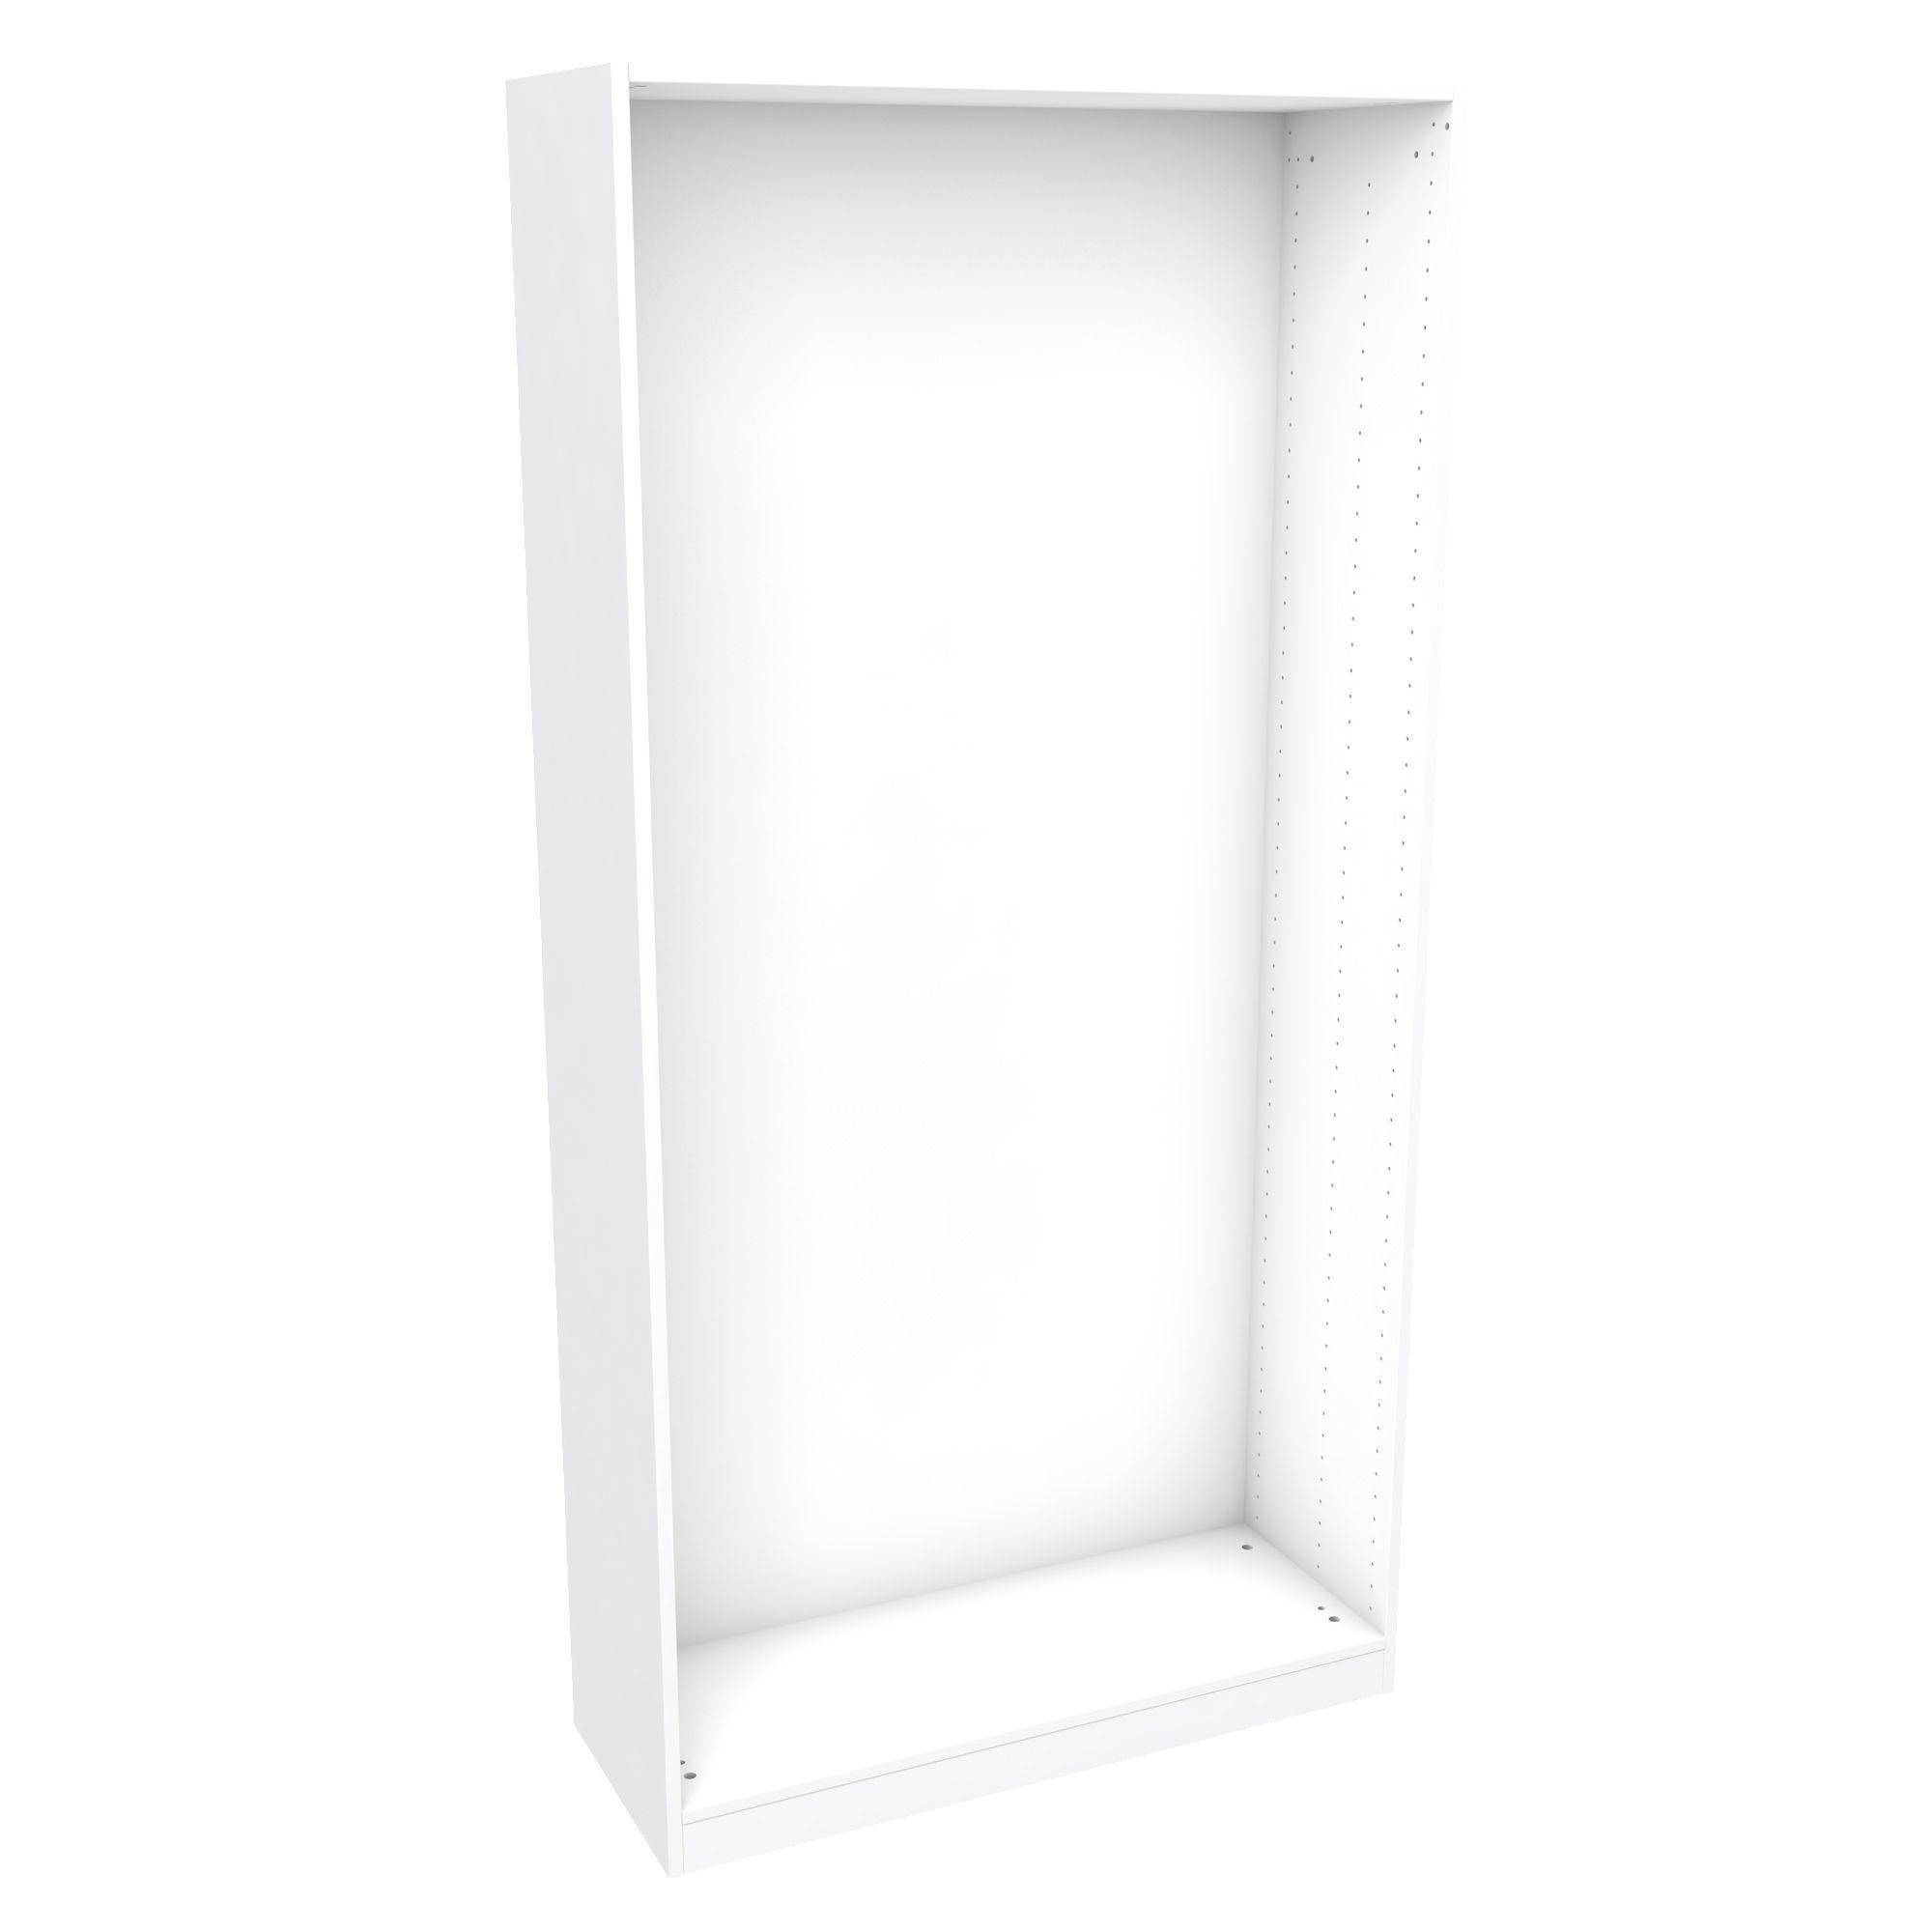 Darwin Modular White Wardrobe Cabinet (h)2004mm (w)1000mm (d)374mm